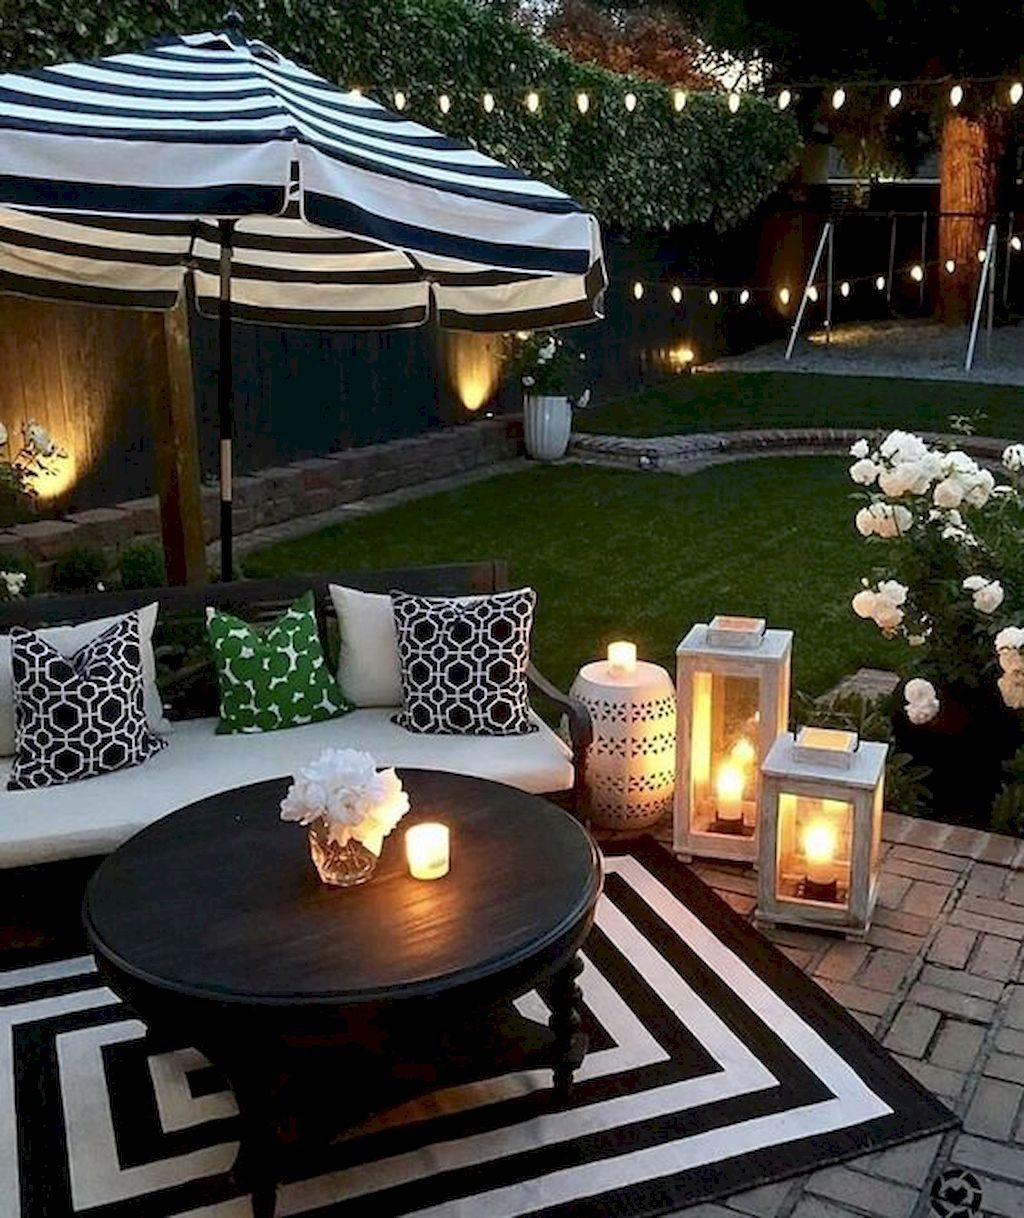 65 Easy Diy Outdoor Fire Pit And Cozy Seating Area Ideas ... tout Salon De Jardin Bennett